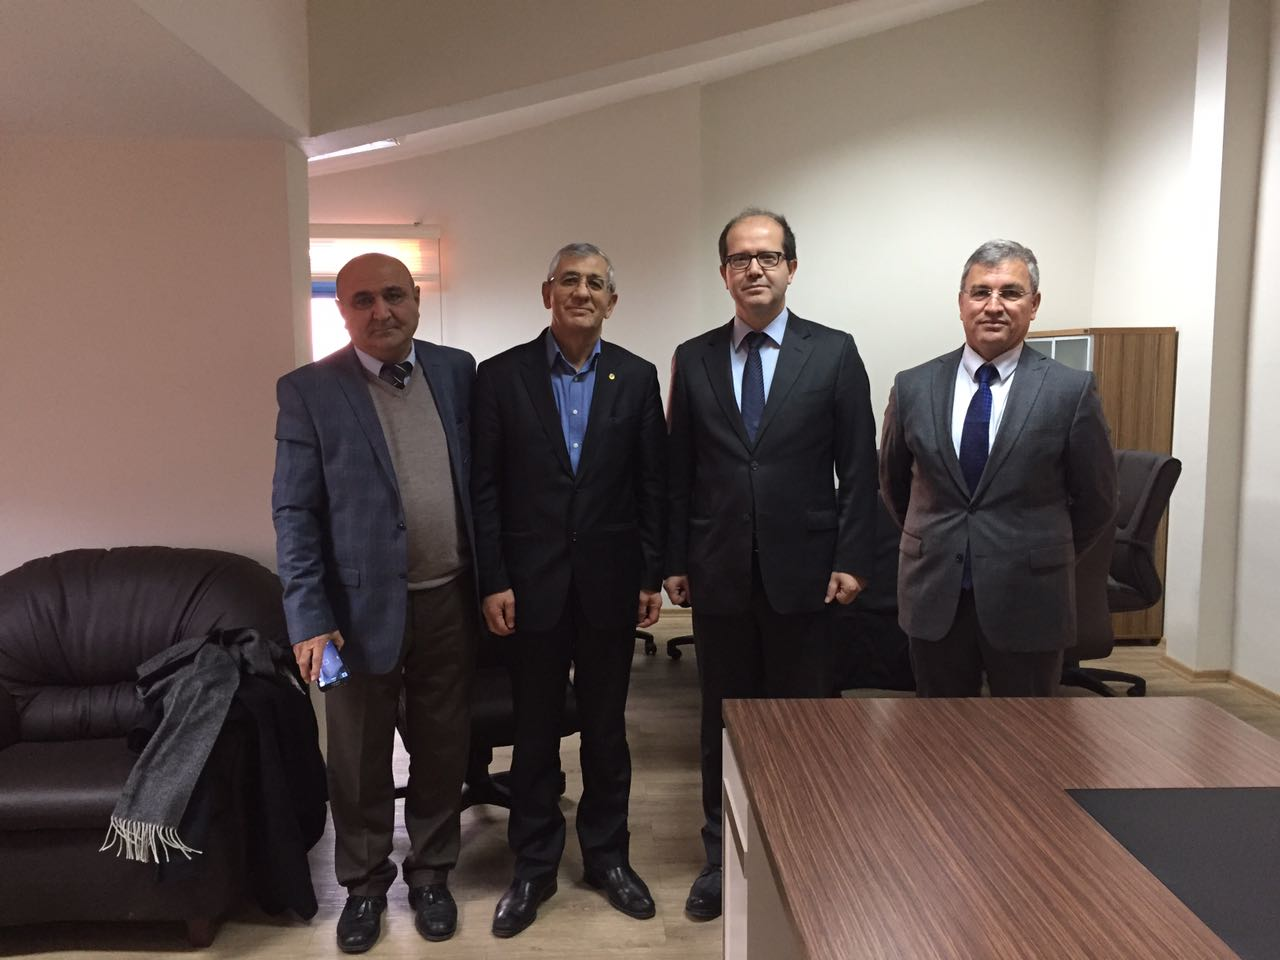 Founder Visits School of Engineering of Ankara University